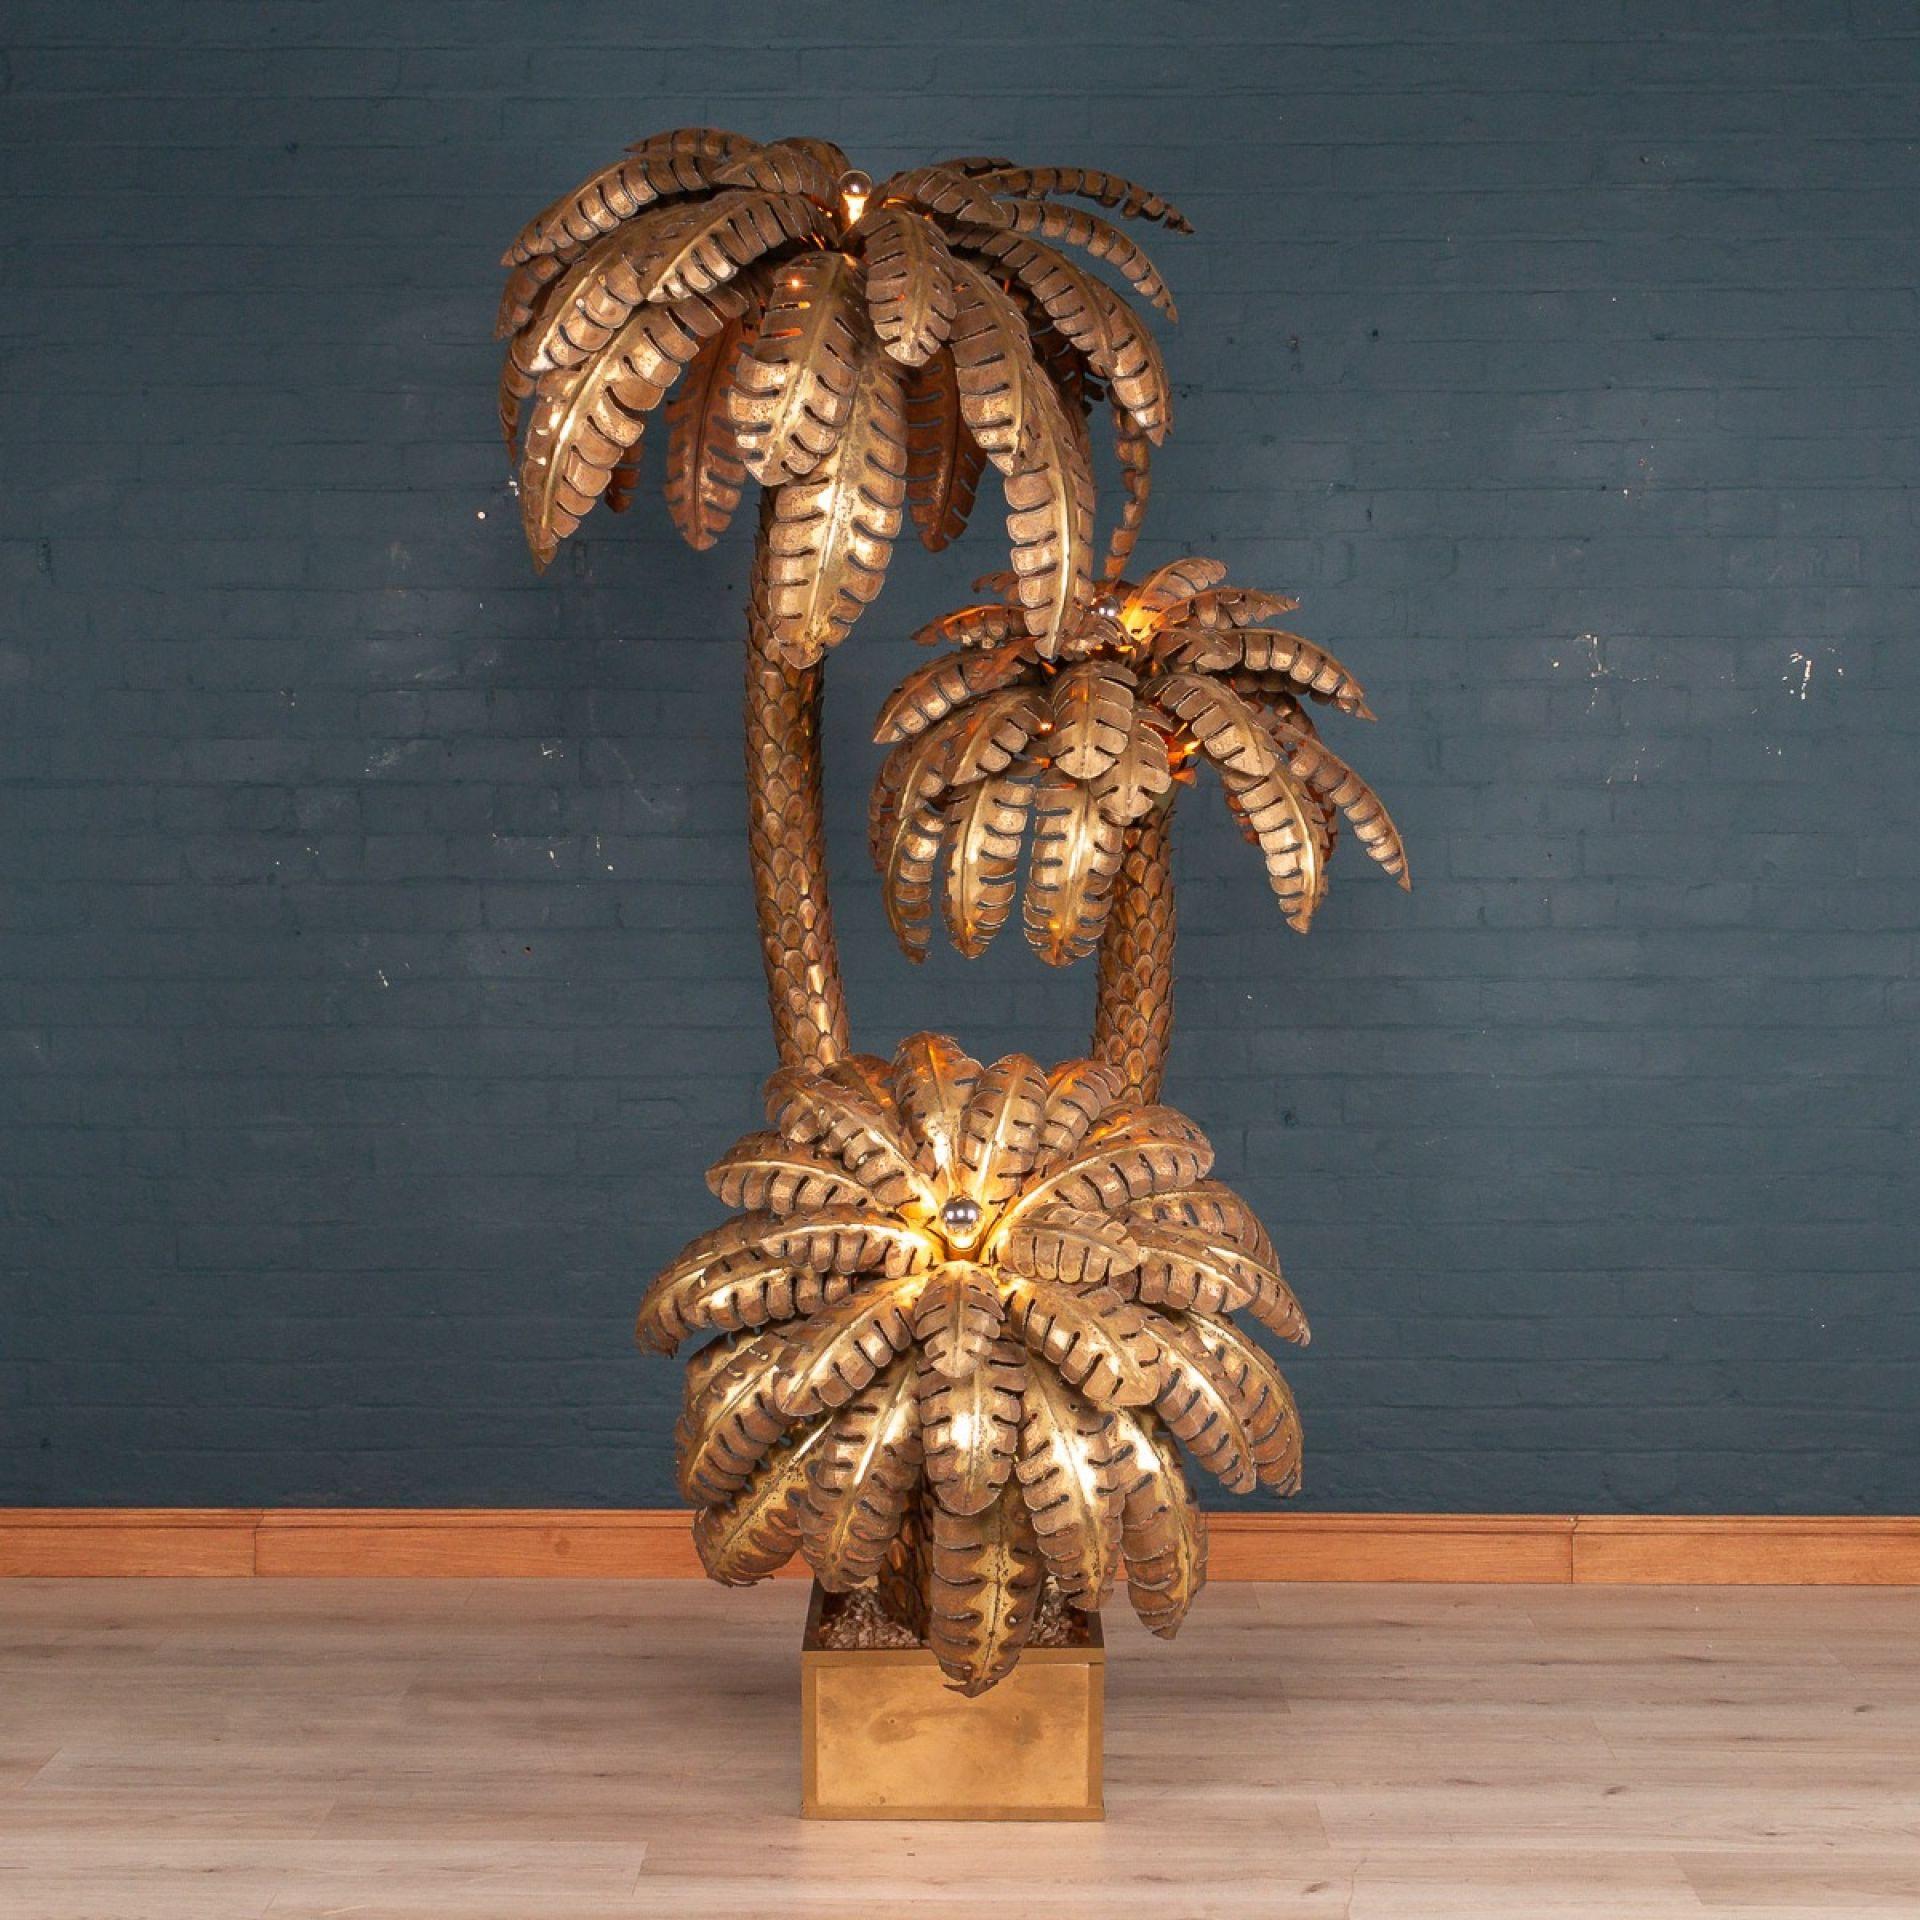 HUGE 20thC PALM TREE FLOOR LAMP BY MAISON JANSEN, FRANCE c.1970